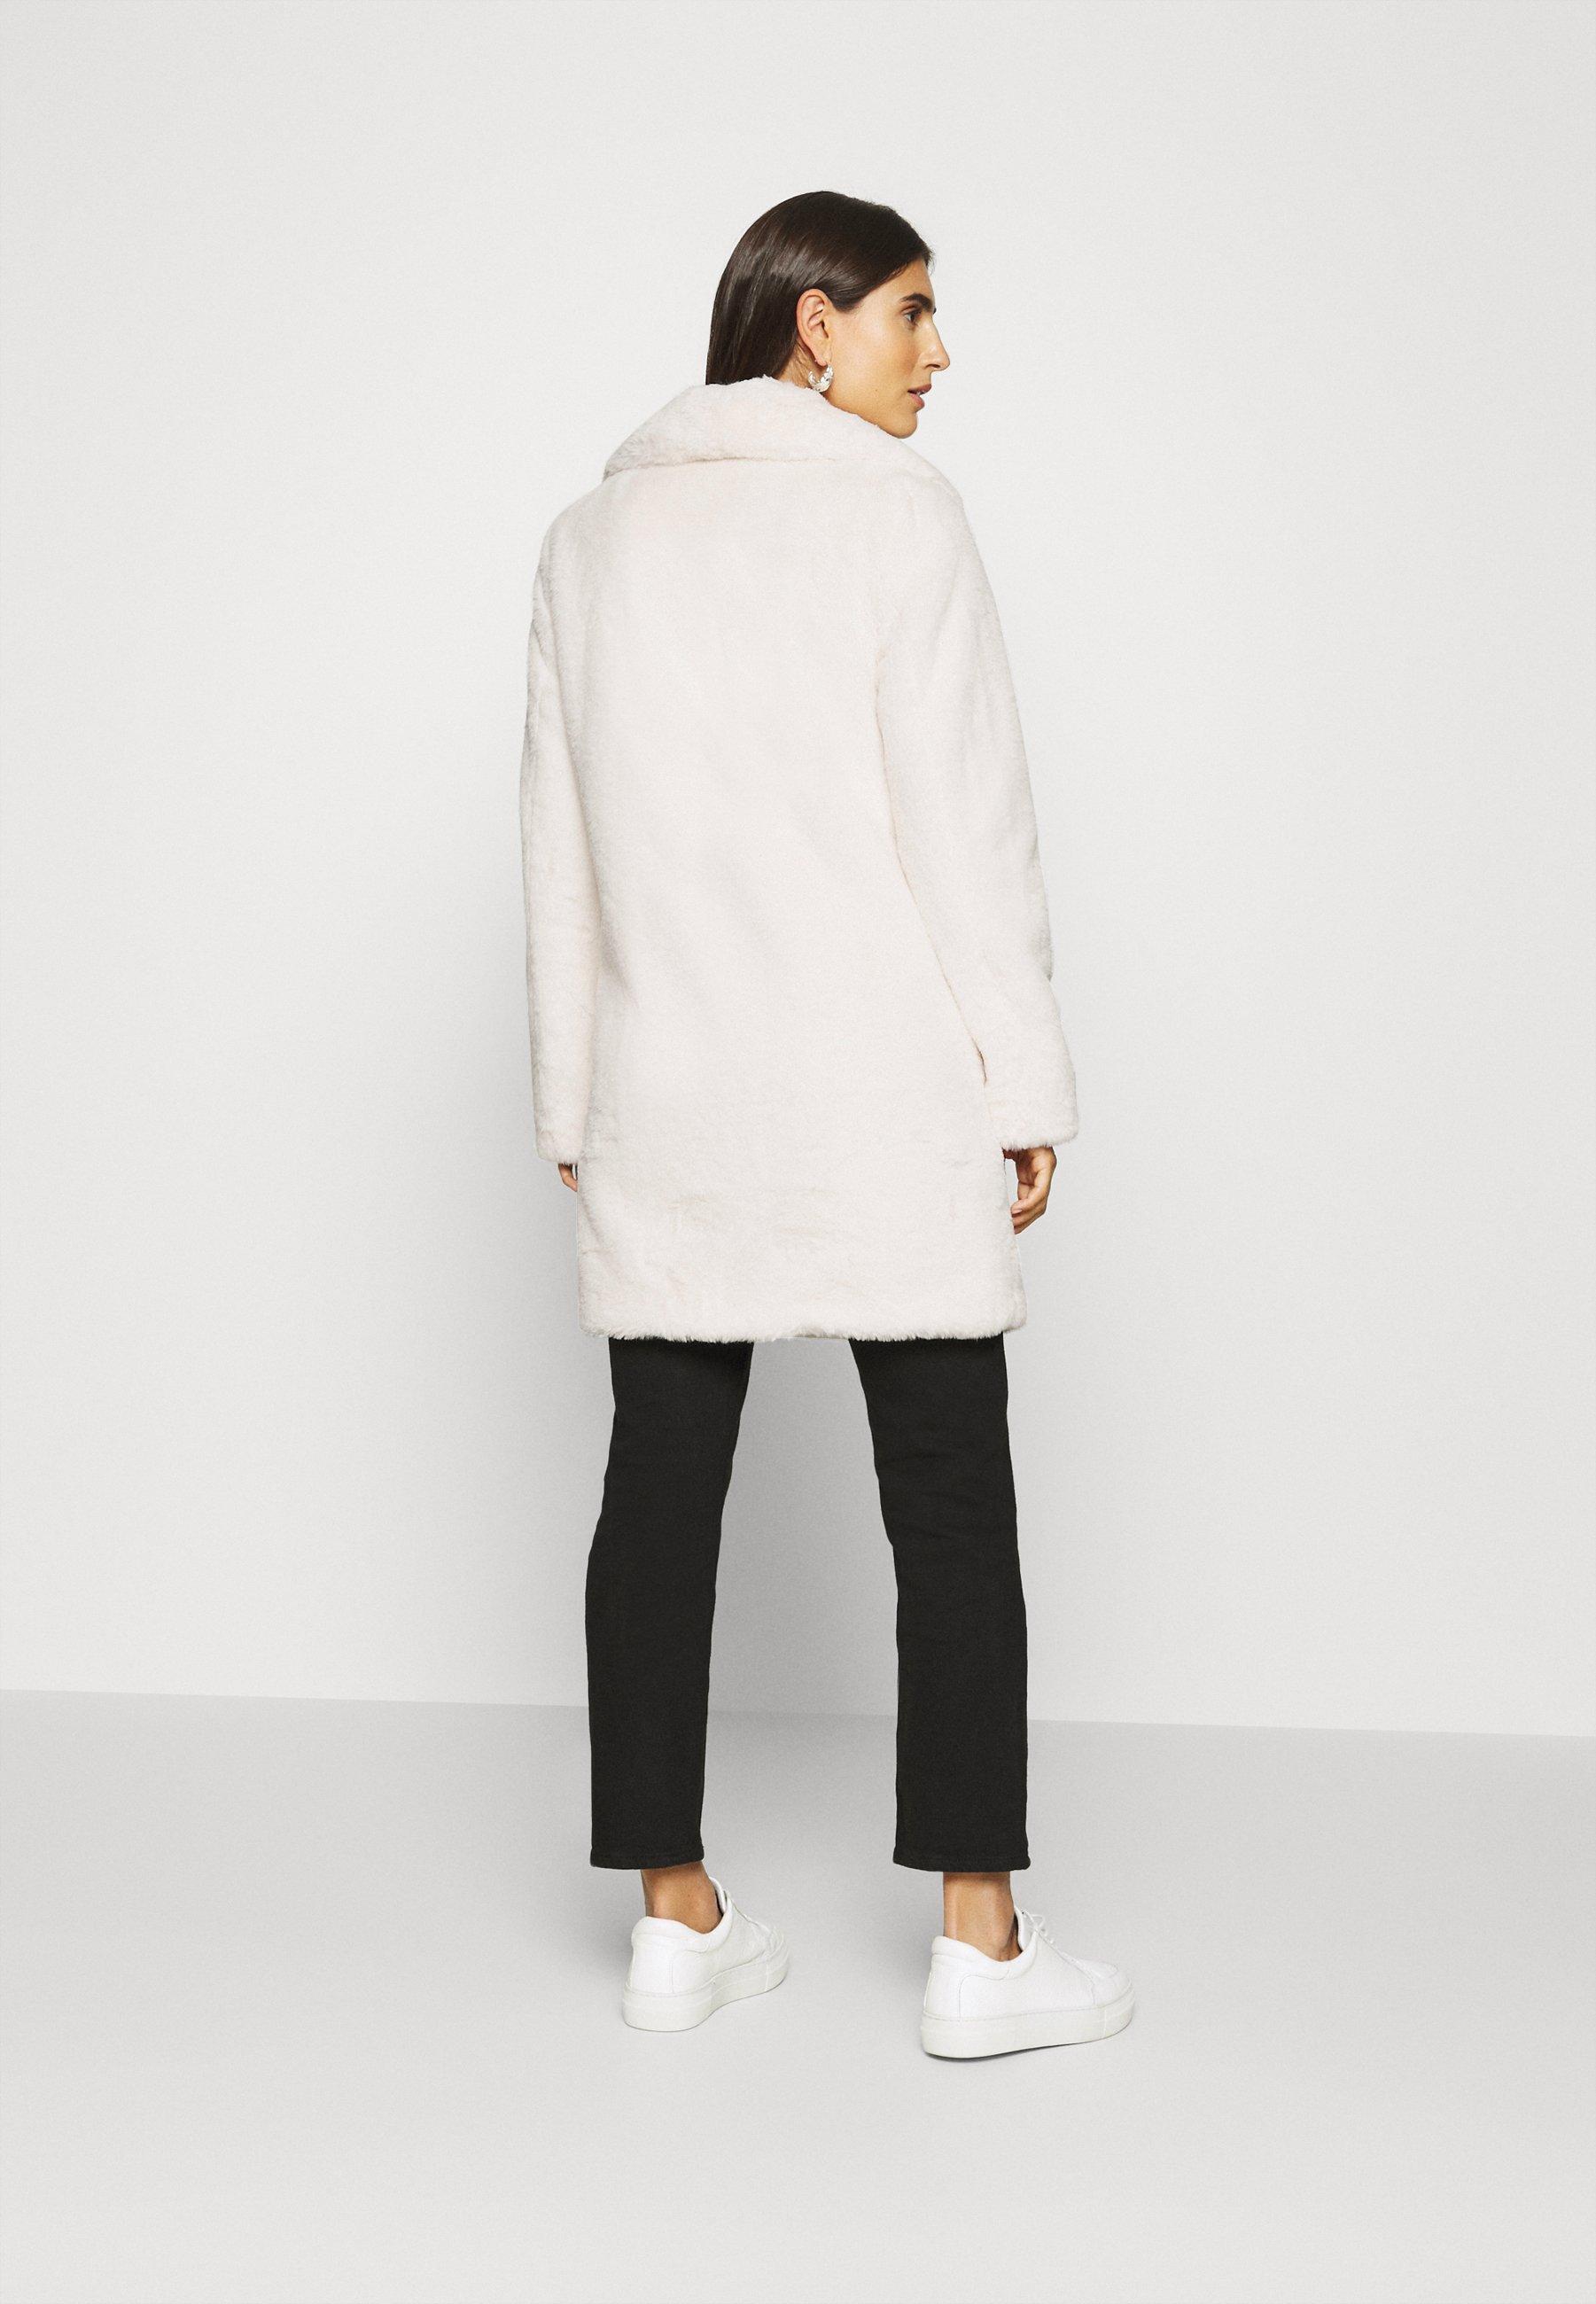 Frieda & Freddies COAT - Veste d'hiver - off white - Manteaux Femme cJHLJ